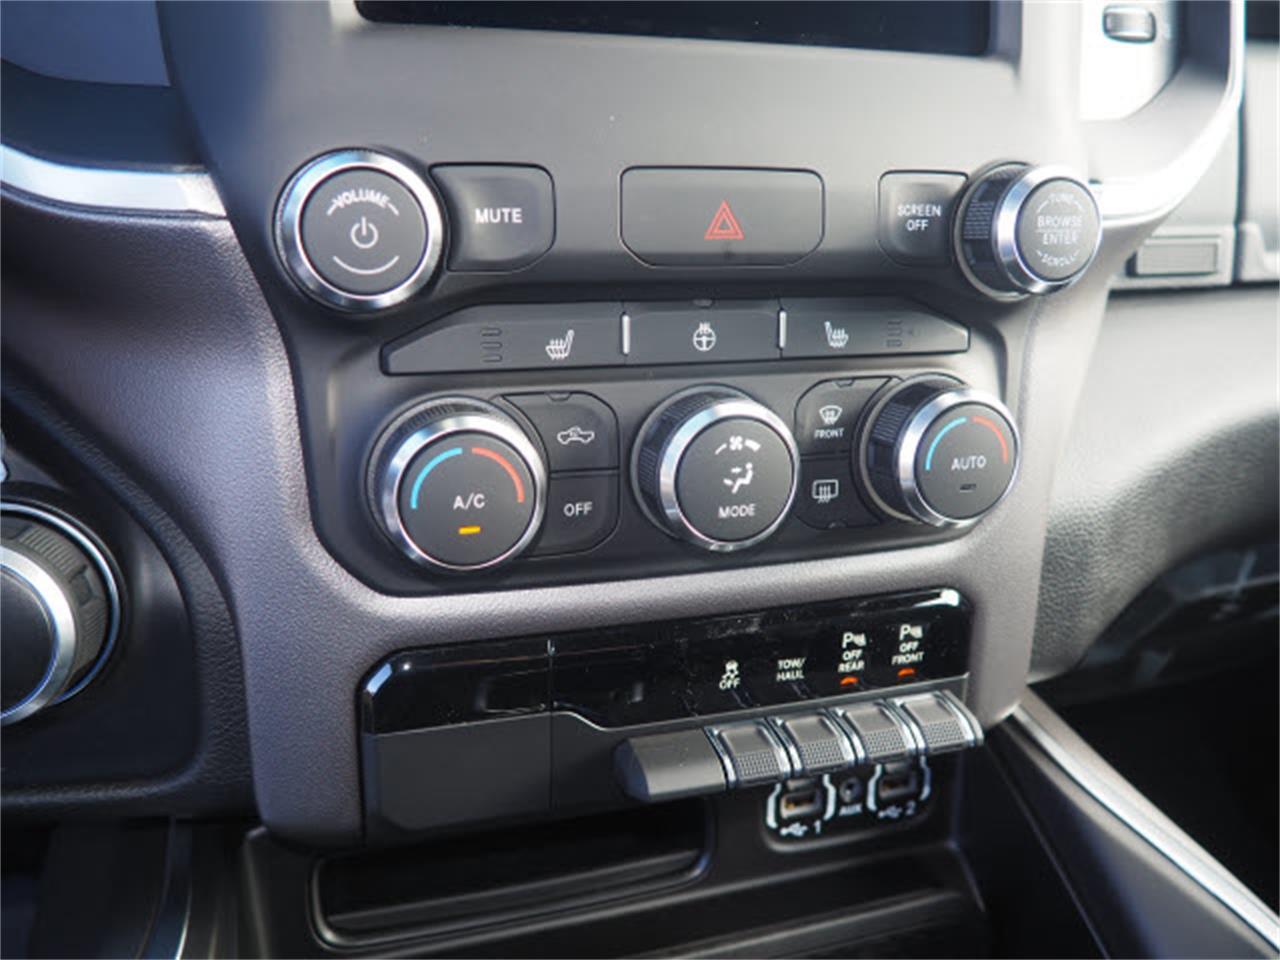 2020 Dodge Ram 1500 (CC-1327531) for sale in Marysville, Ohio